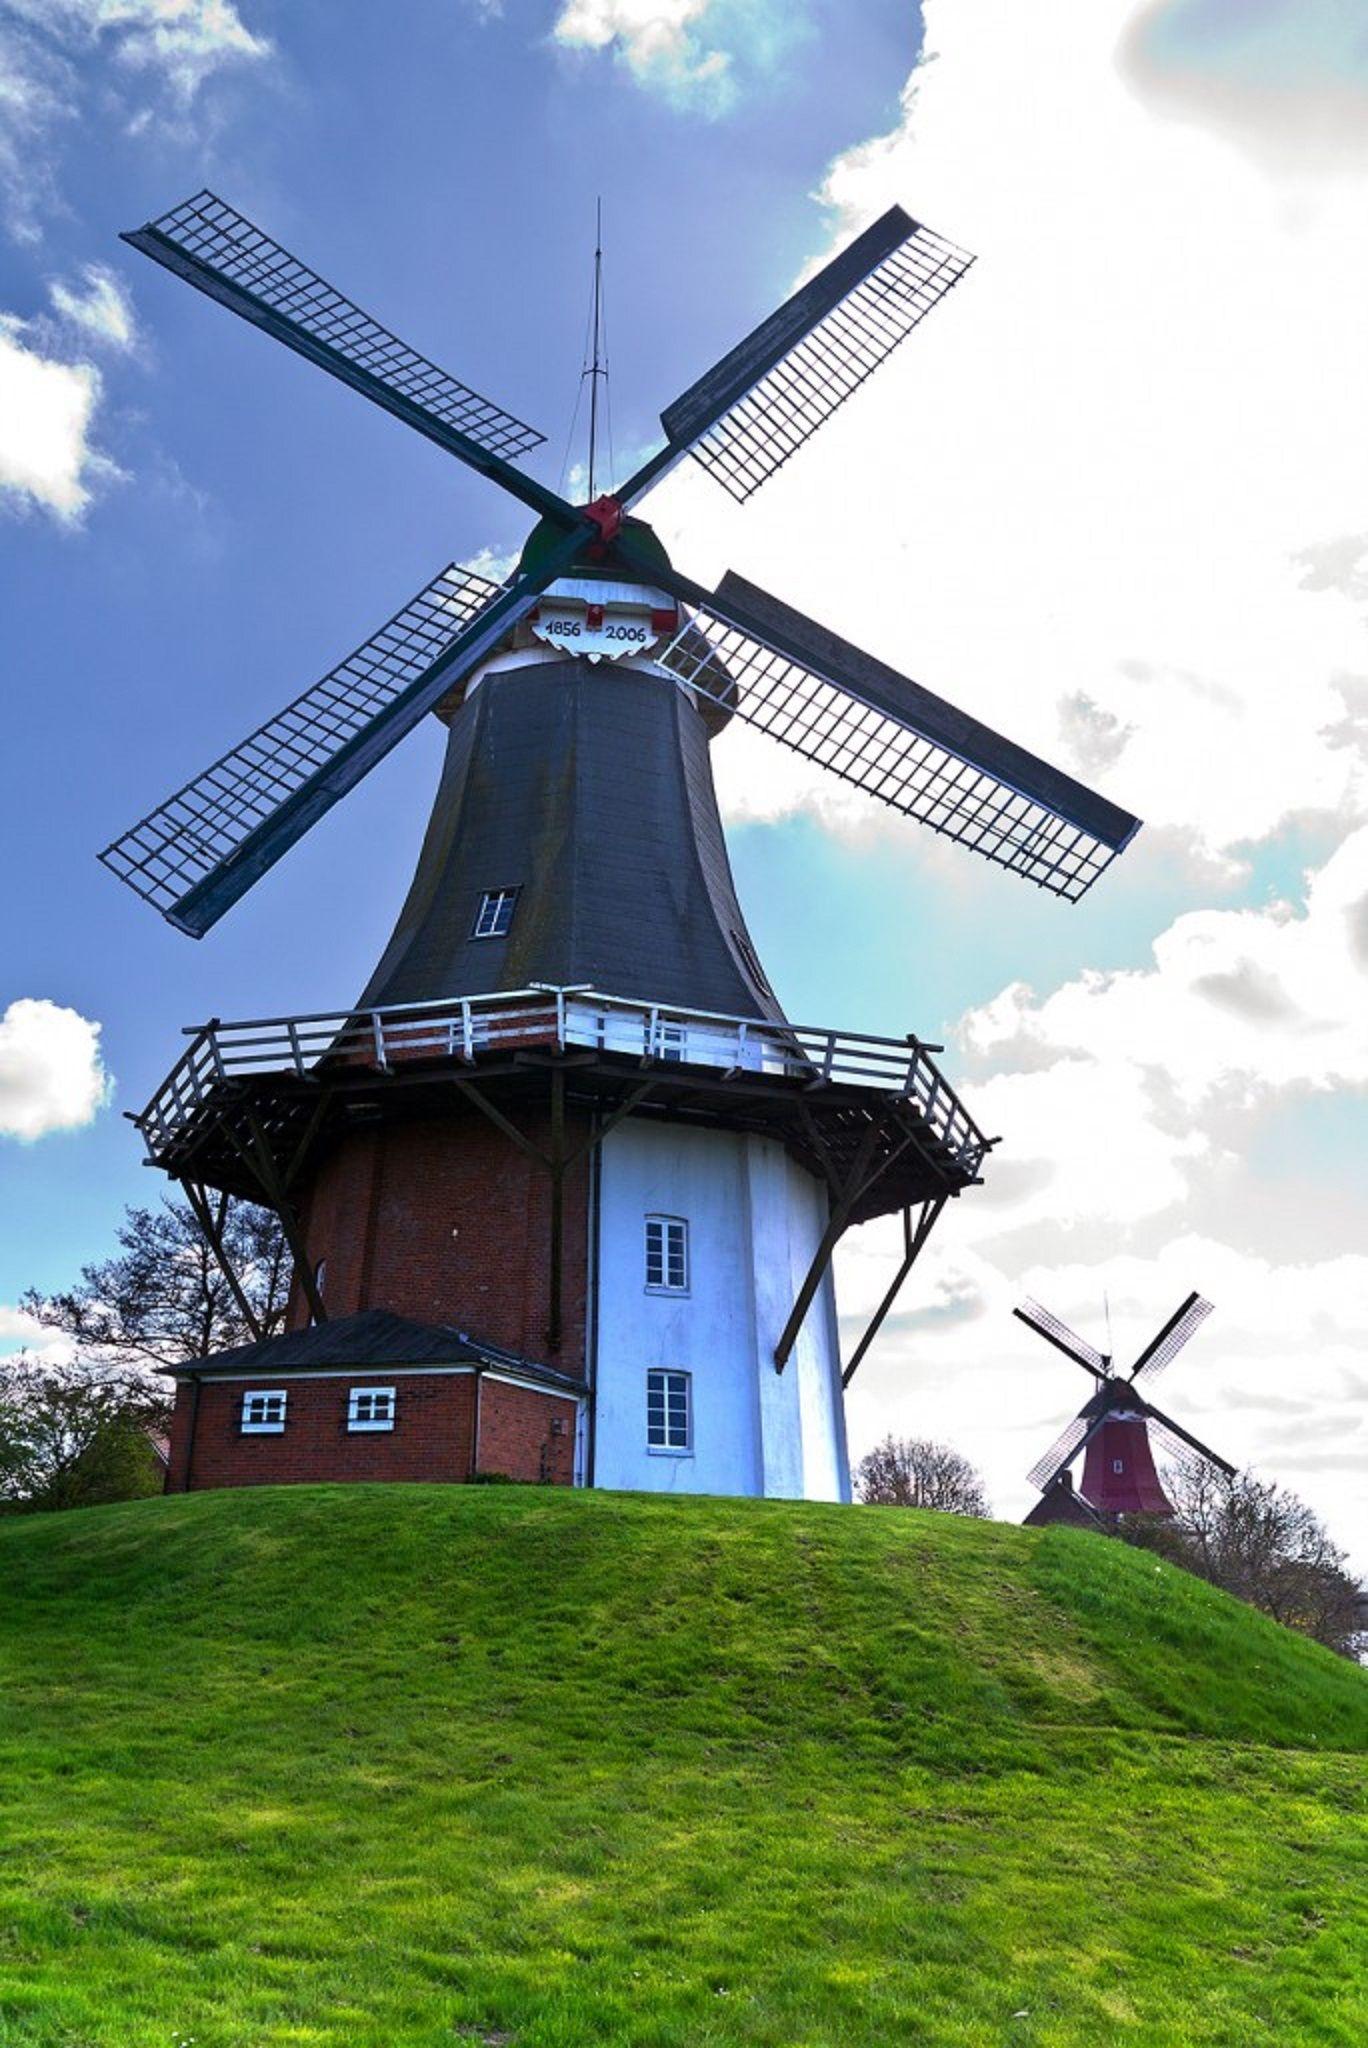 The twin Windmills Fantail - GREETSIEL, Krummhorn: western East Frisia, Germany - Individual mills.